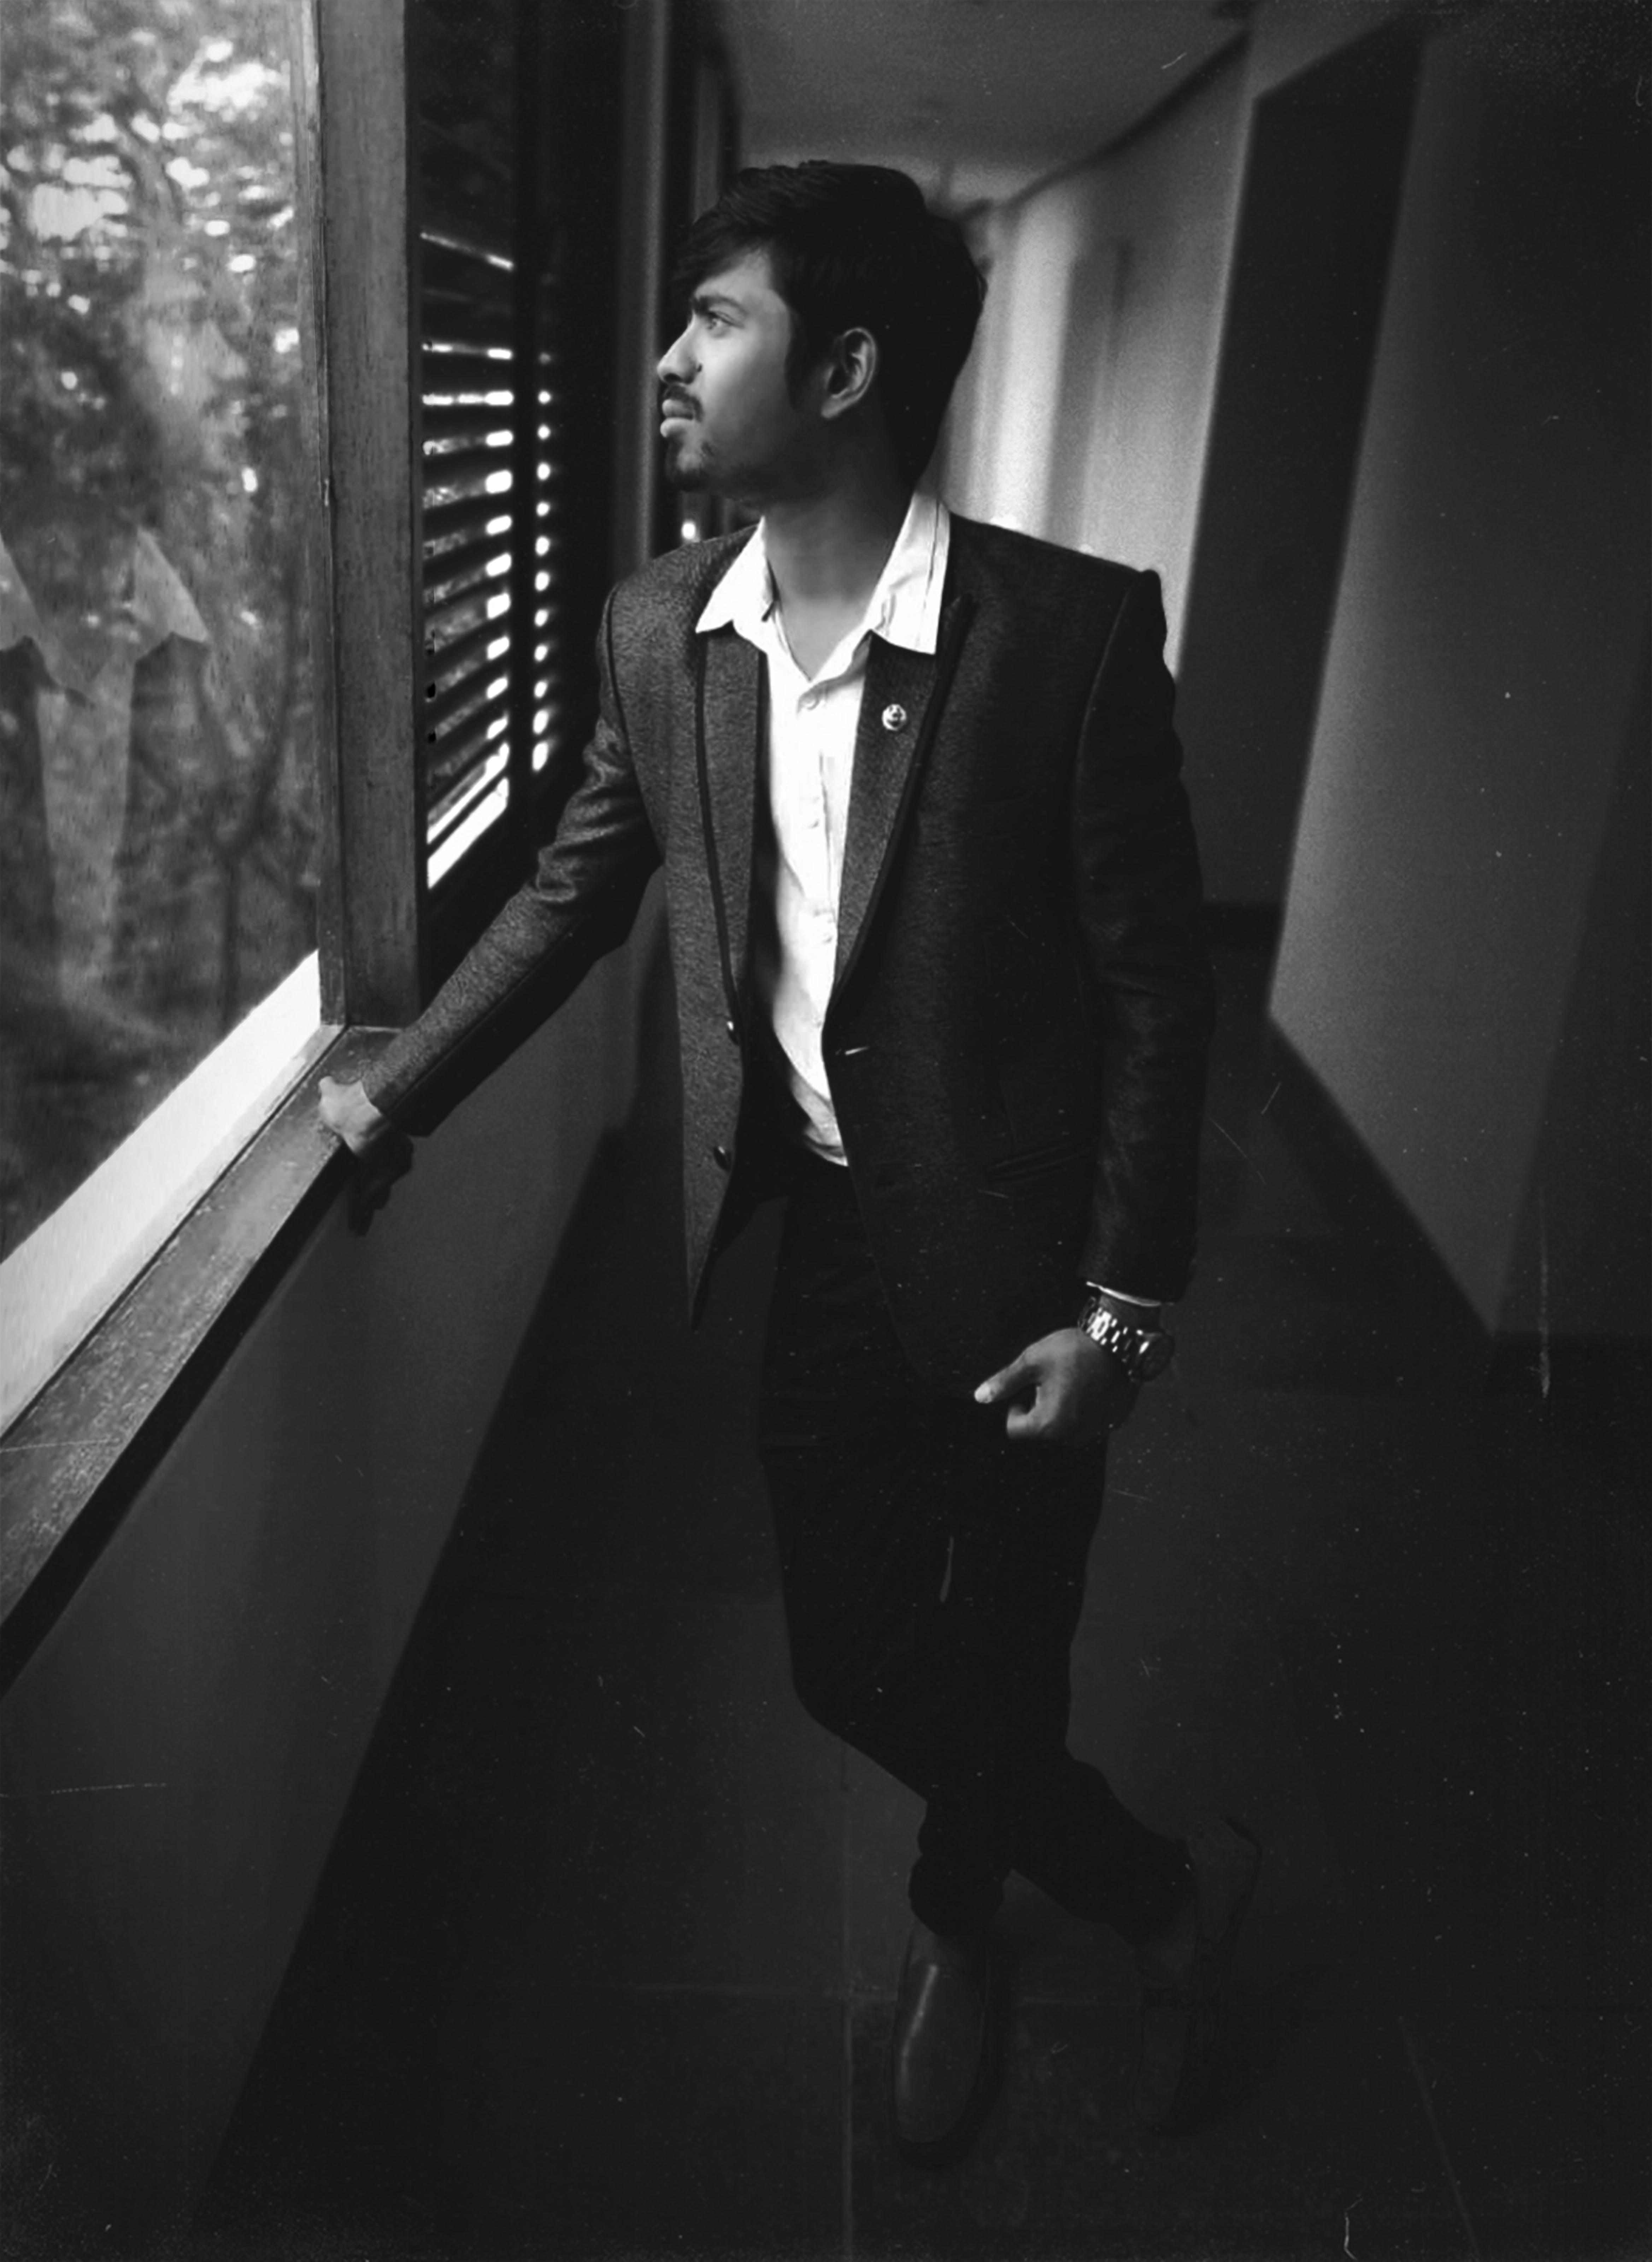 Free stock photo of black and white, classic, classy, corridor